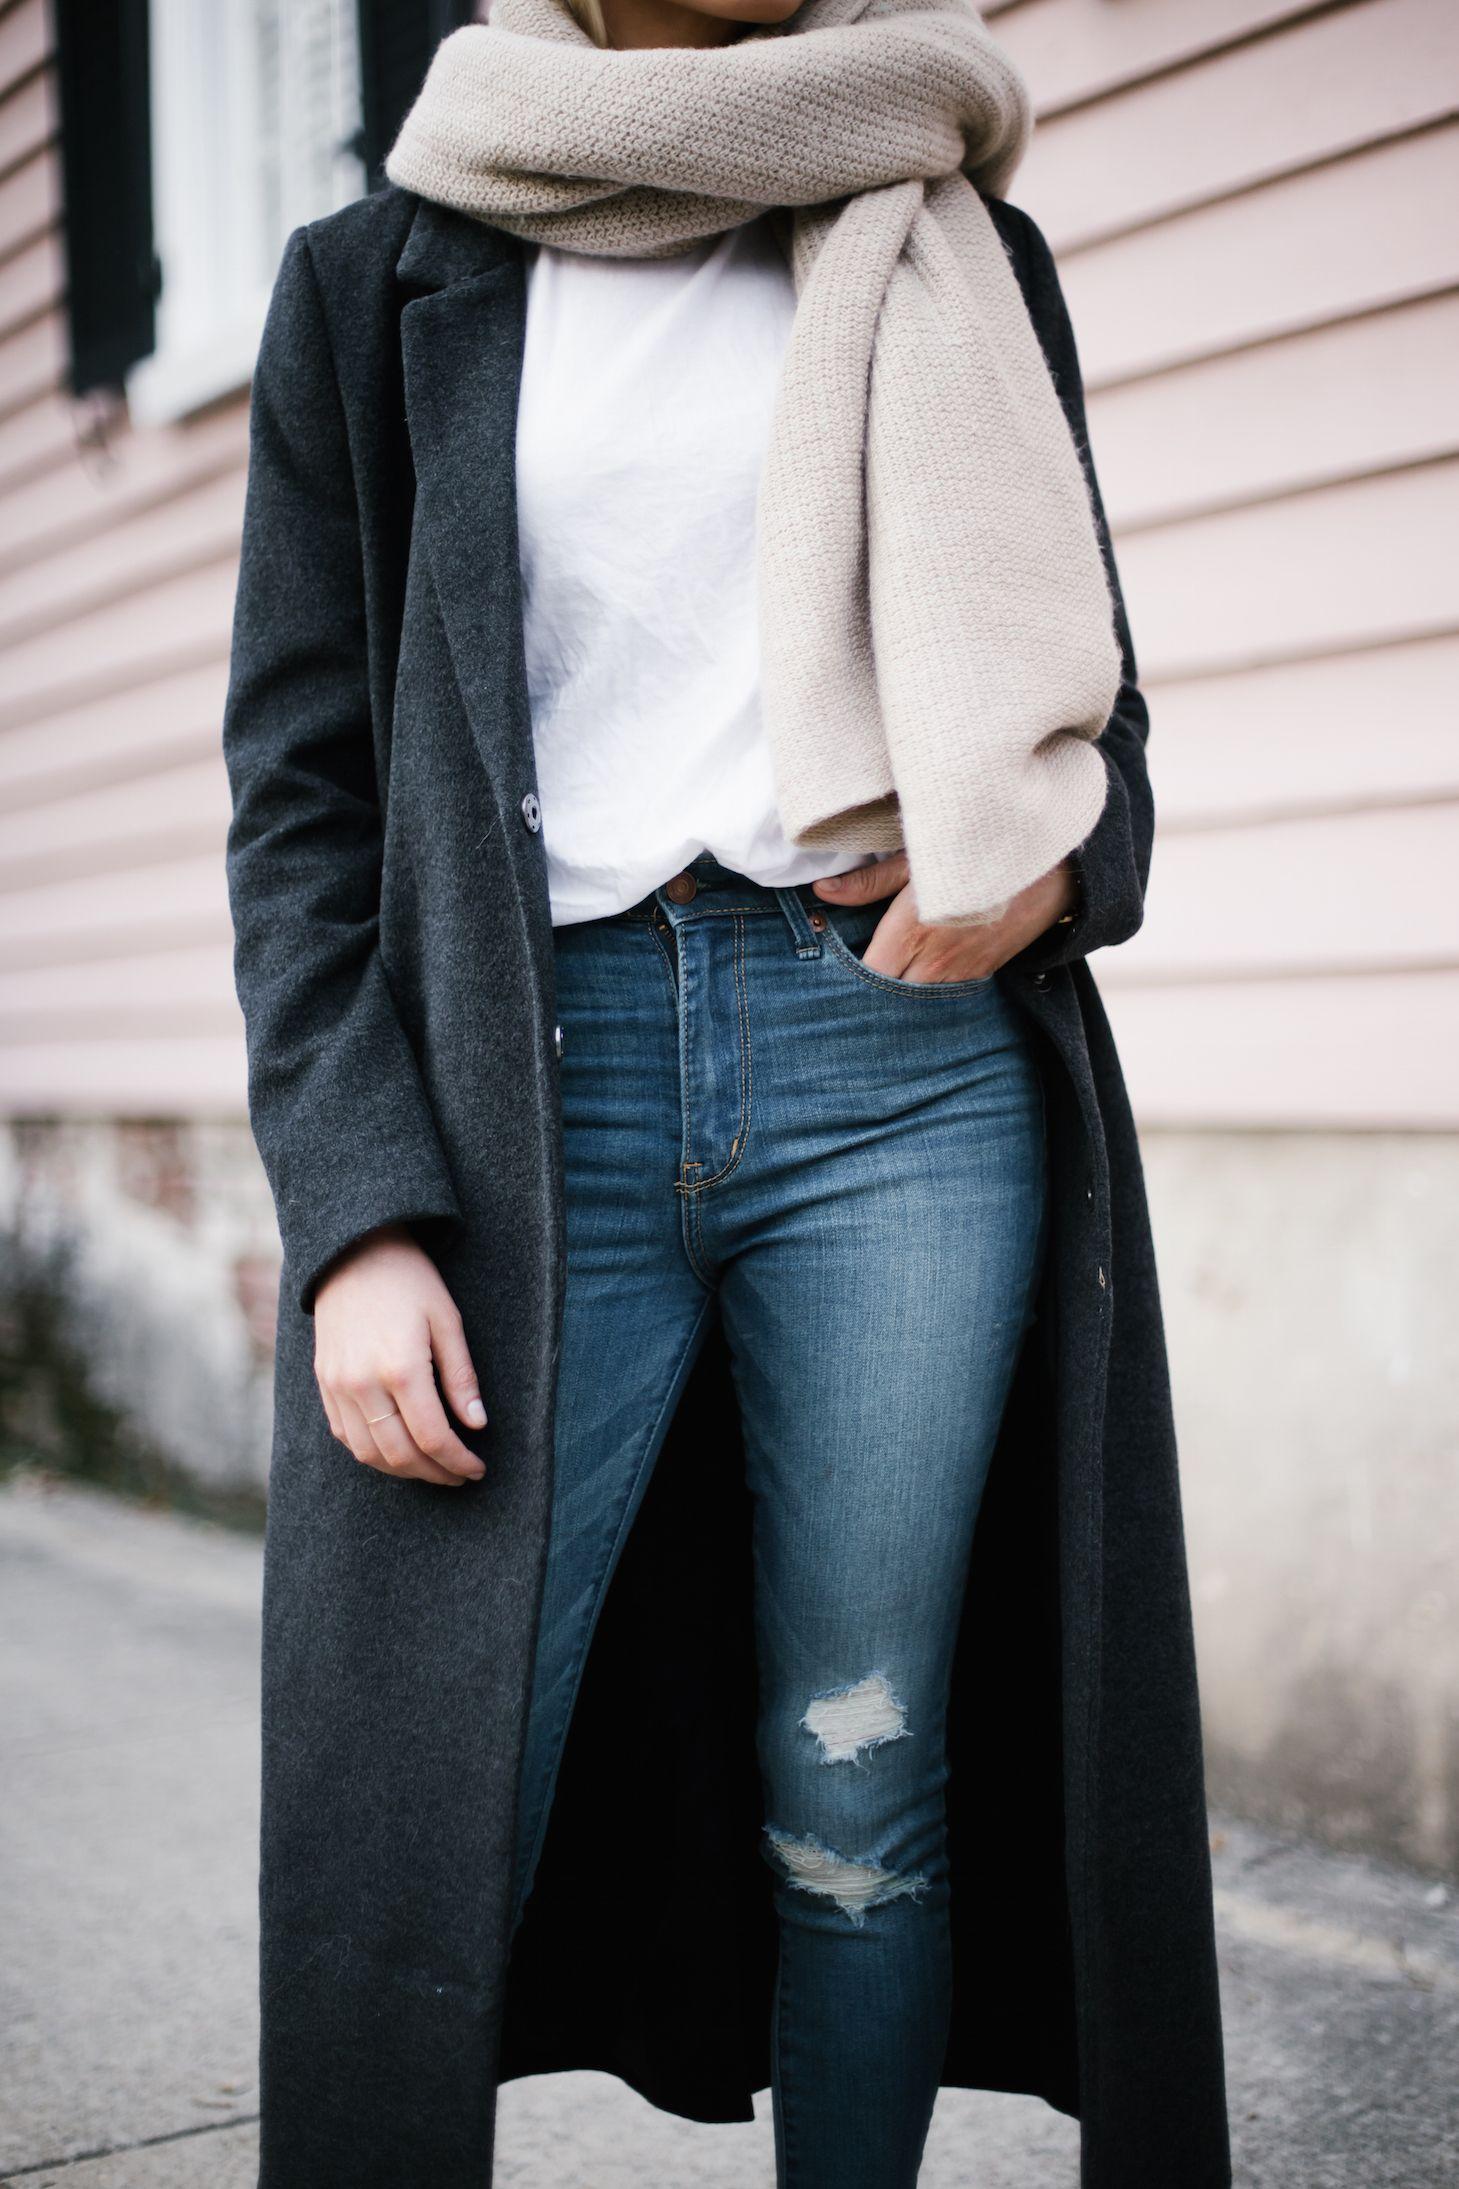 7a799a4bfdc Bundled Up charcoal long wool coat dark grey white crew neck tee shirt  skinny denim jeans